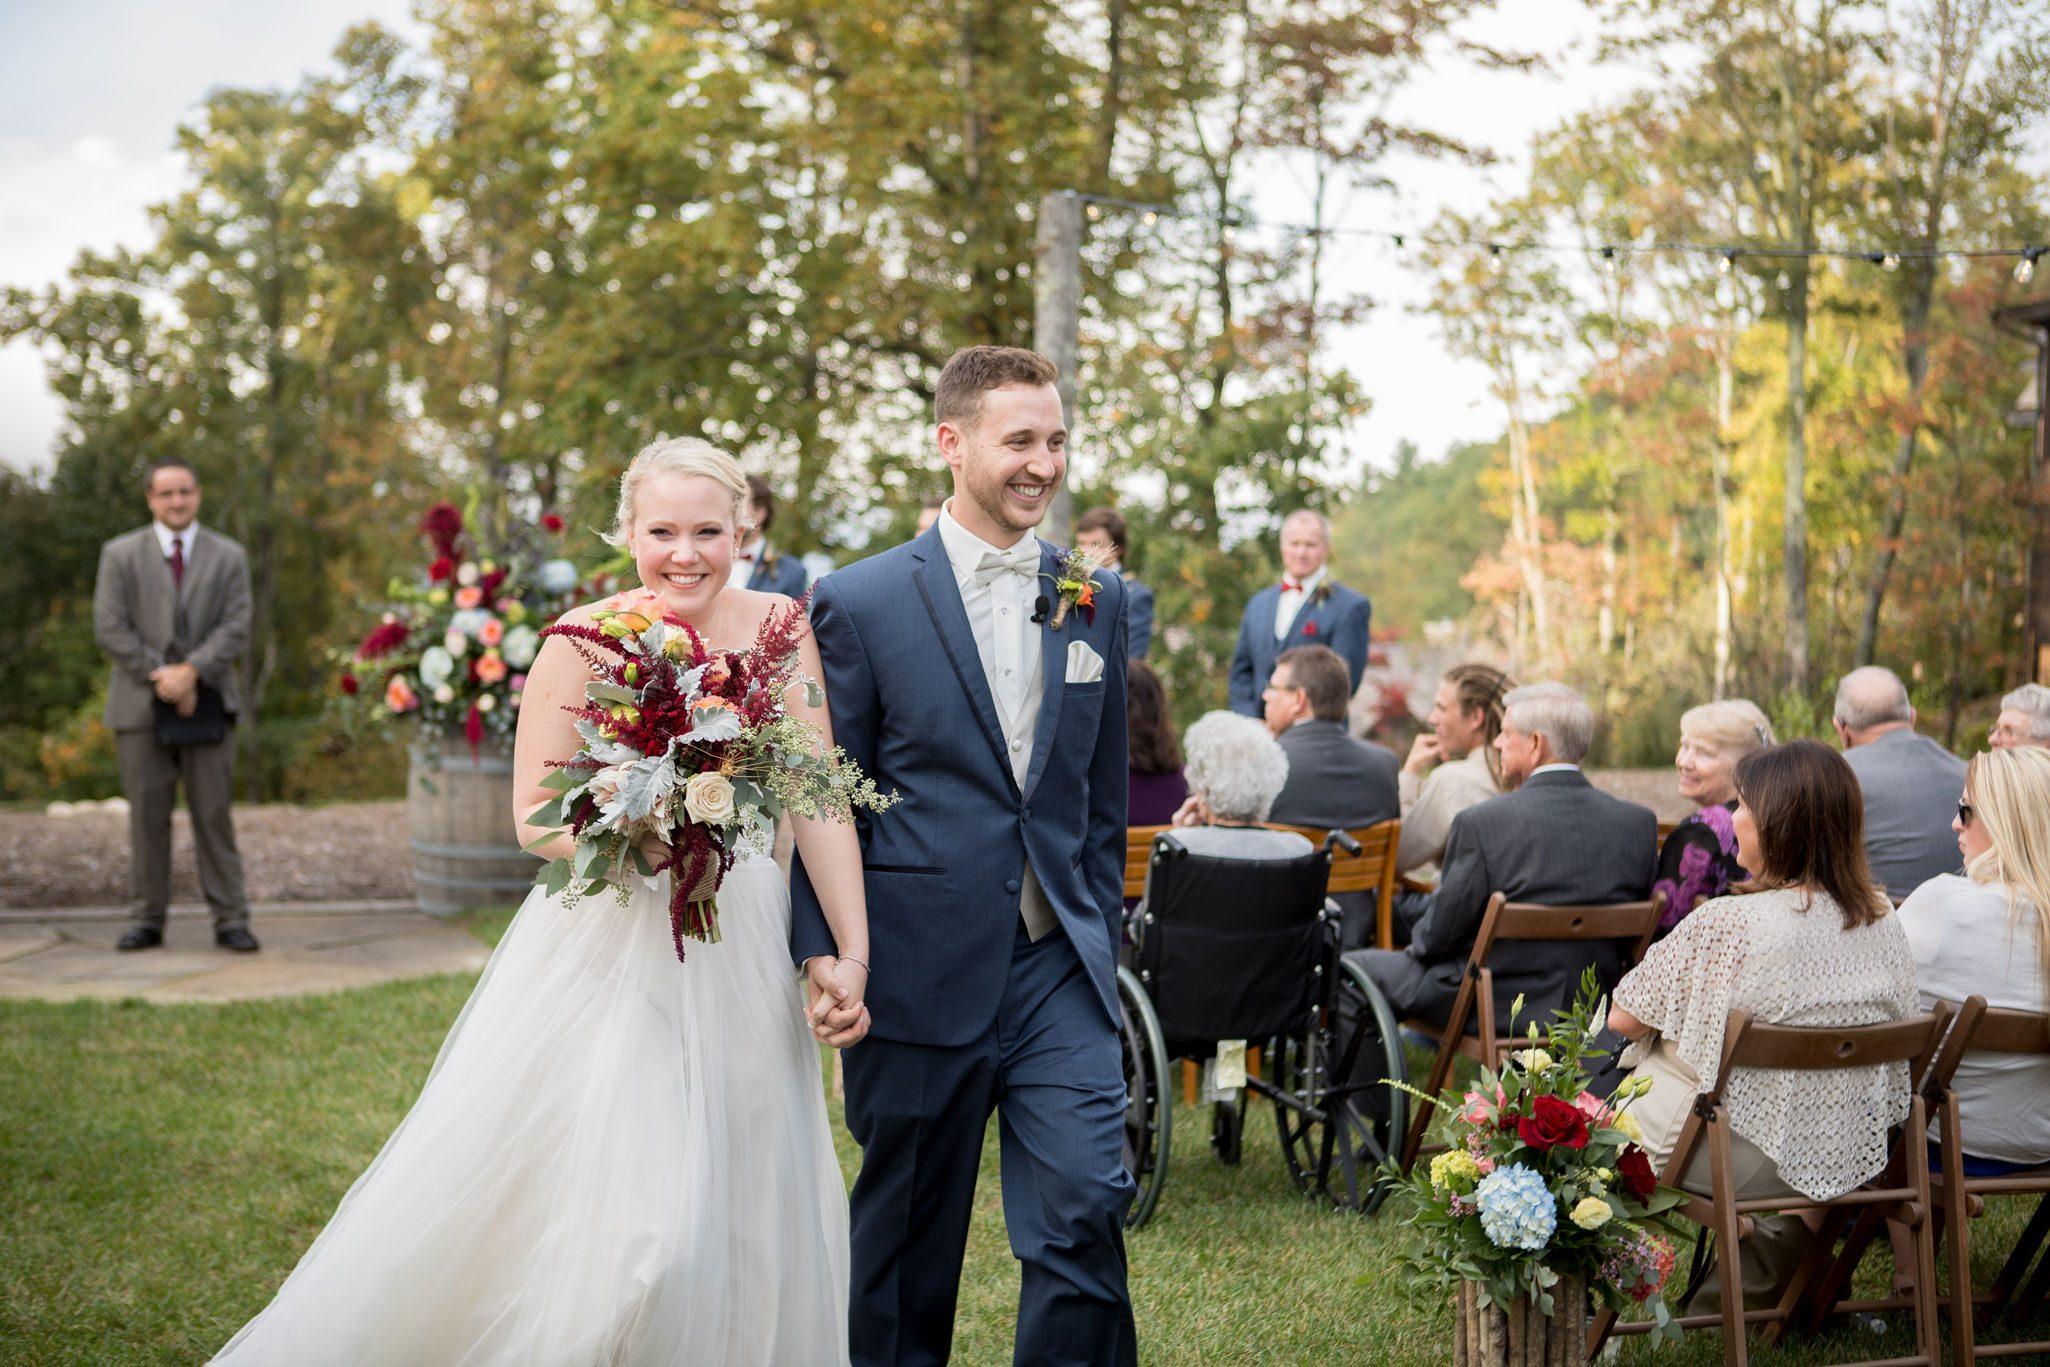 Bliss after I Do - Blue Ridge Mountain Wedding, North Carolina